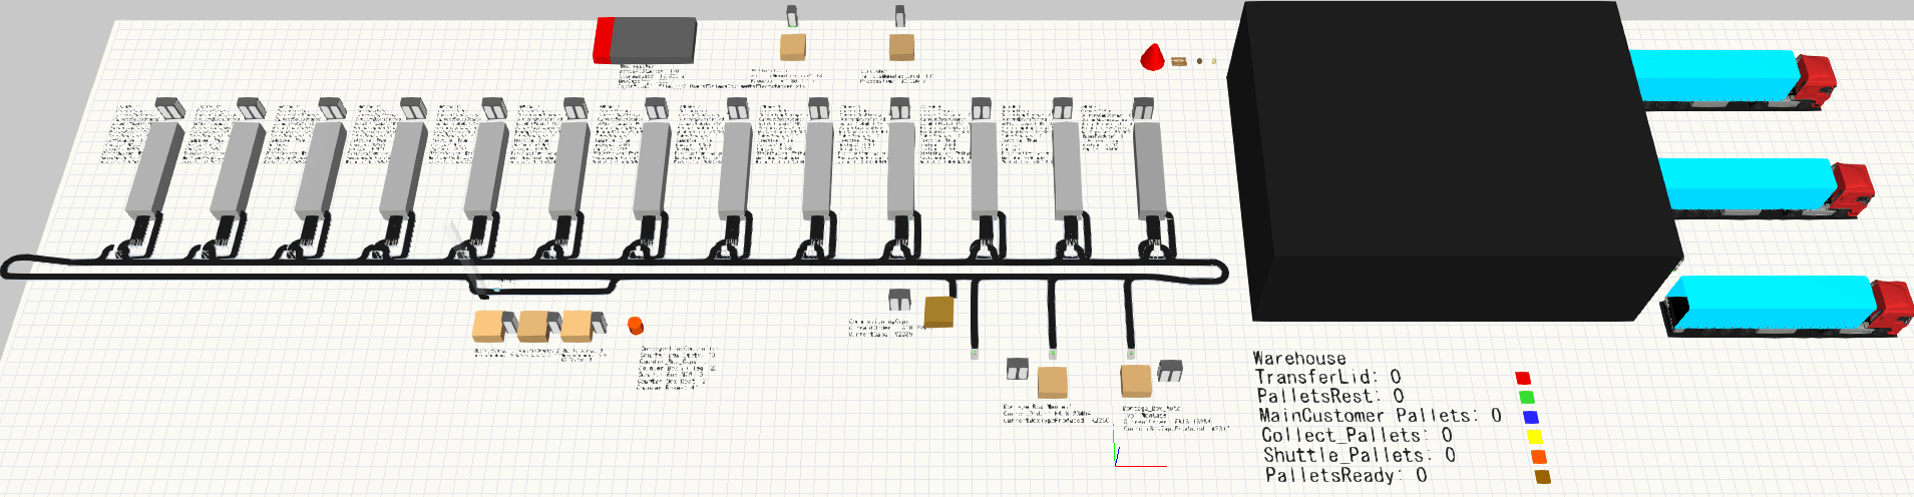 Tubing 4.0 mit 3D-Simulation